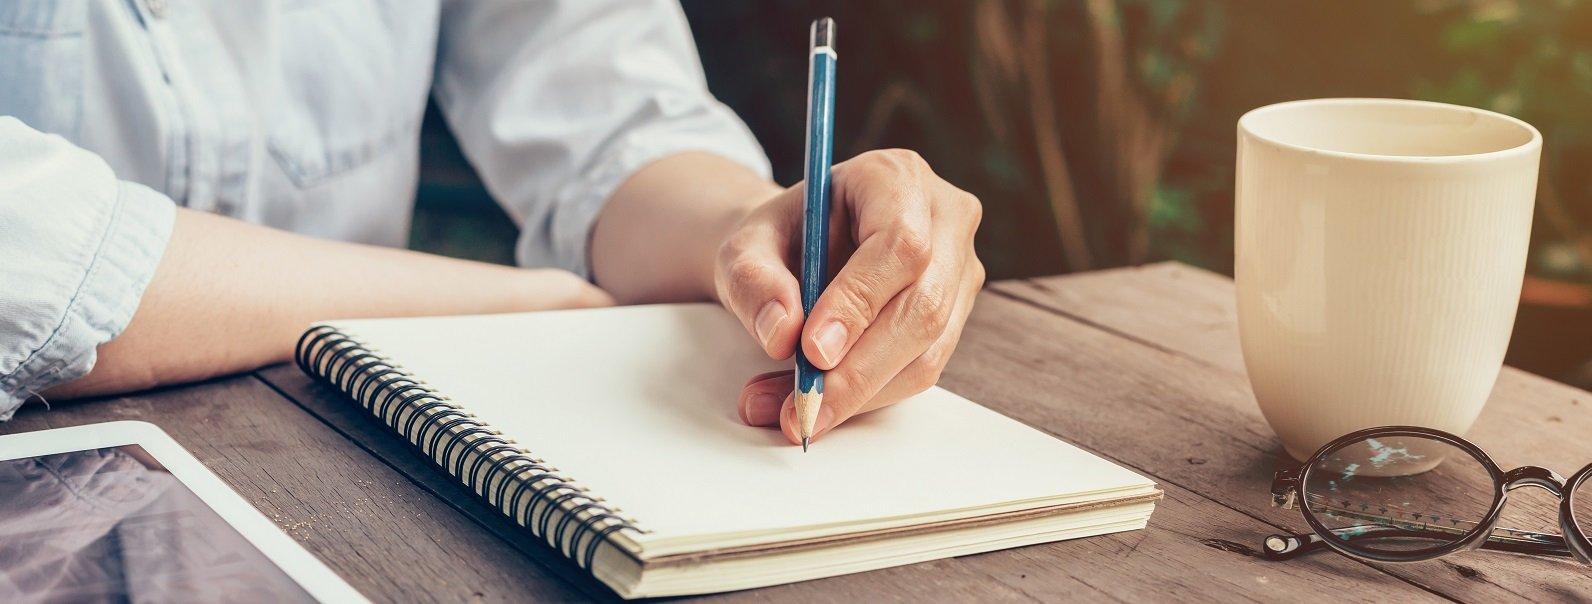 Creative essay scholarships